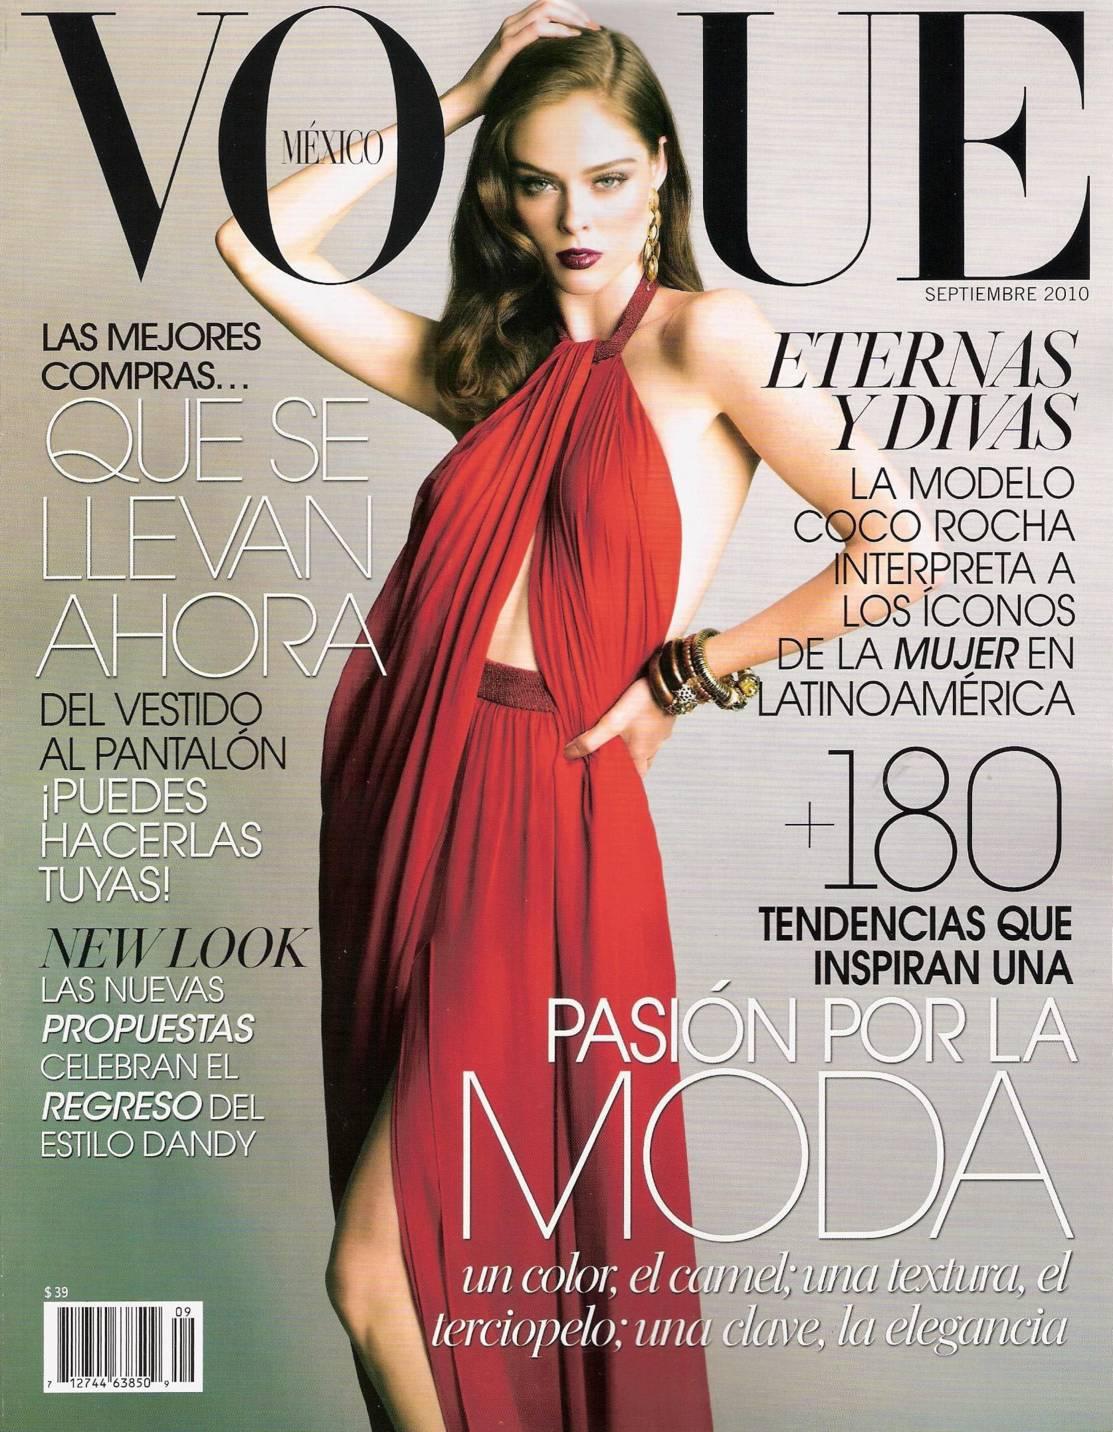 http://4.bp.blogspot.com/_FUYvMNTJrjU/THroAKdXgeI/AAAAAAAALuQ/0HrD0Zk35u0/s1600/Coco+Rocha+Vogue+Mexico.jpg